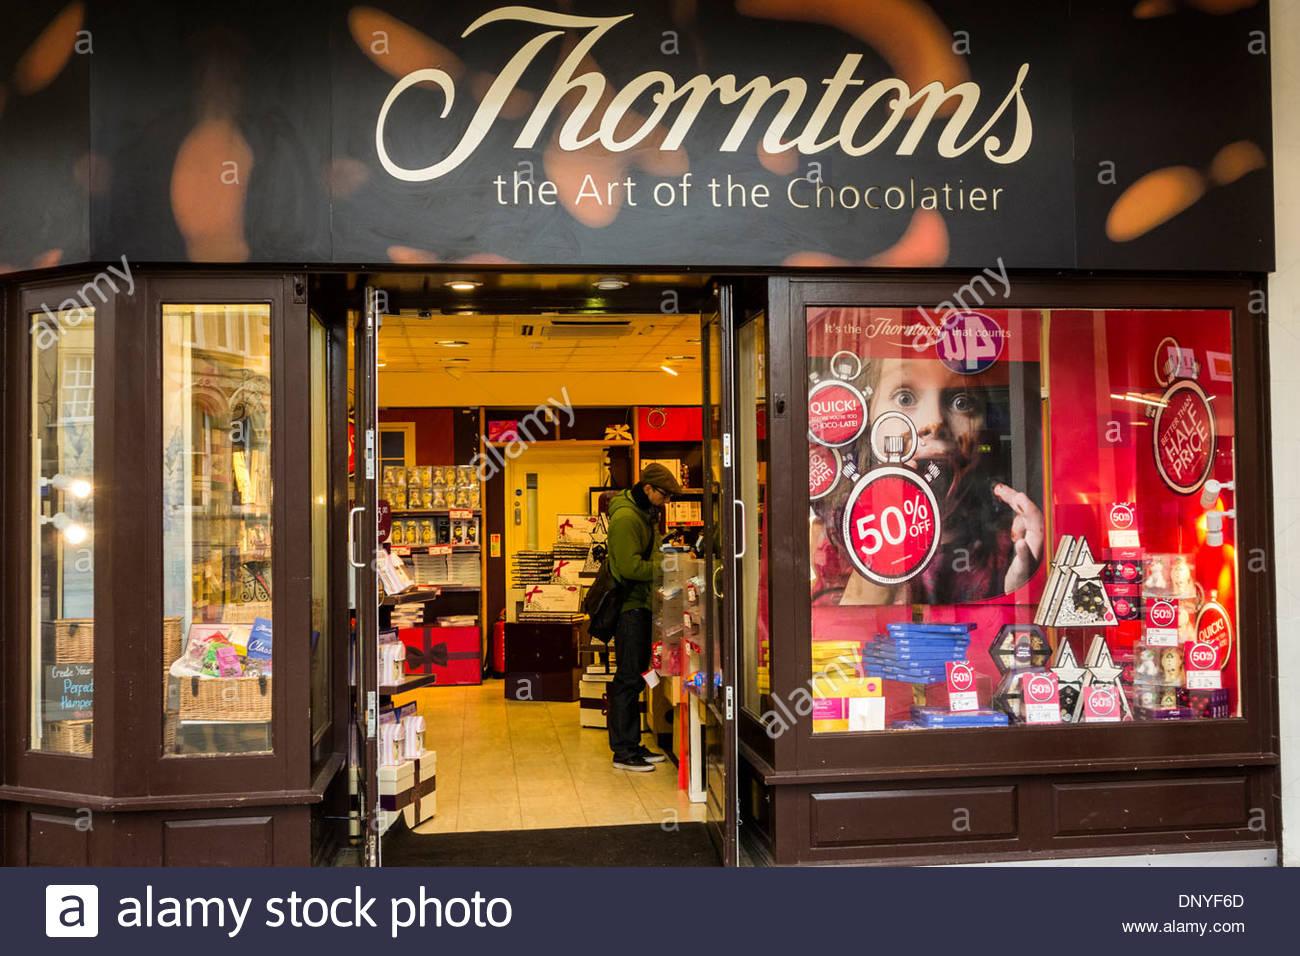 Thorntons sweet and chocolate shop in Cambridge, England, UK - Stock Image